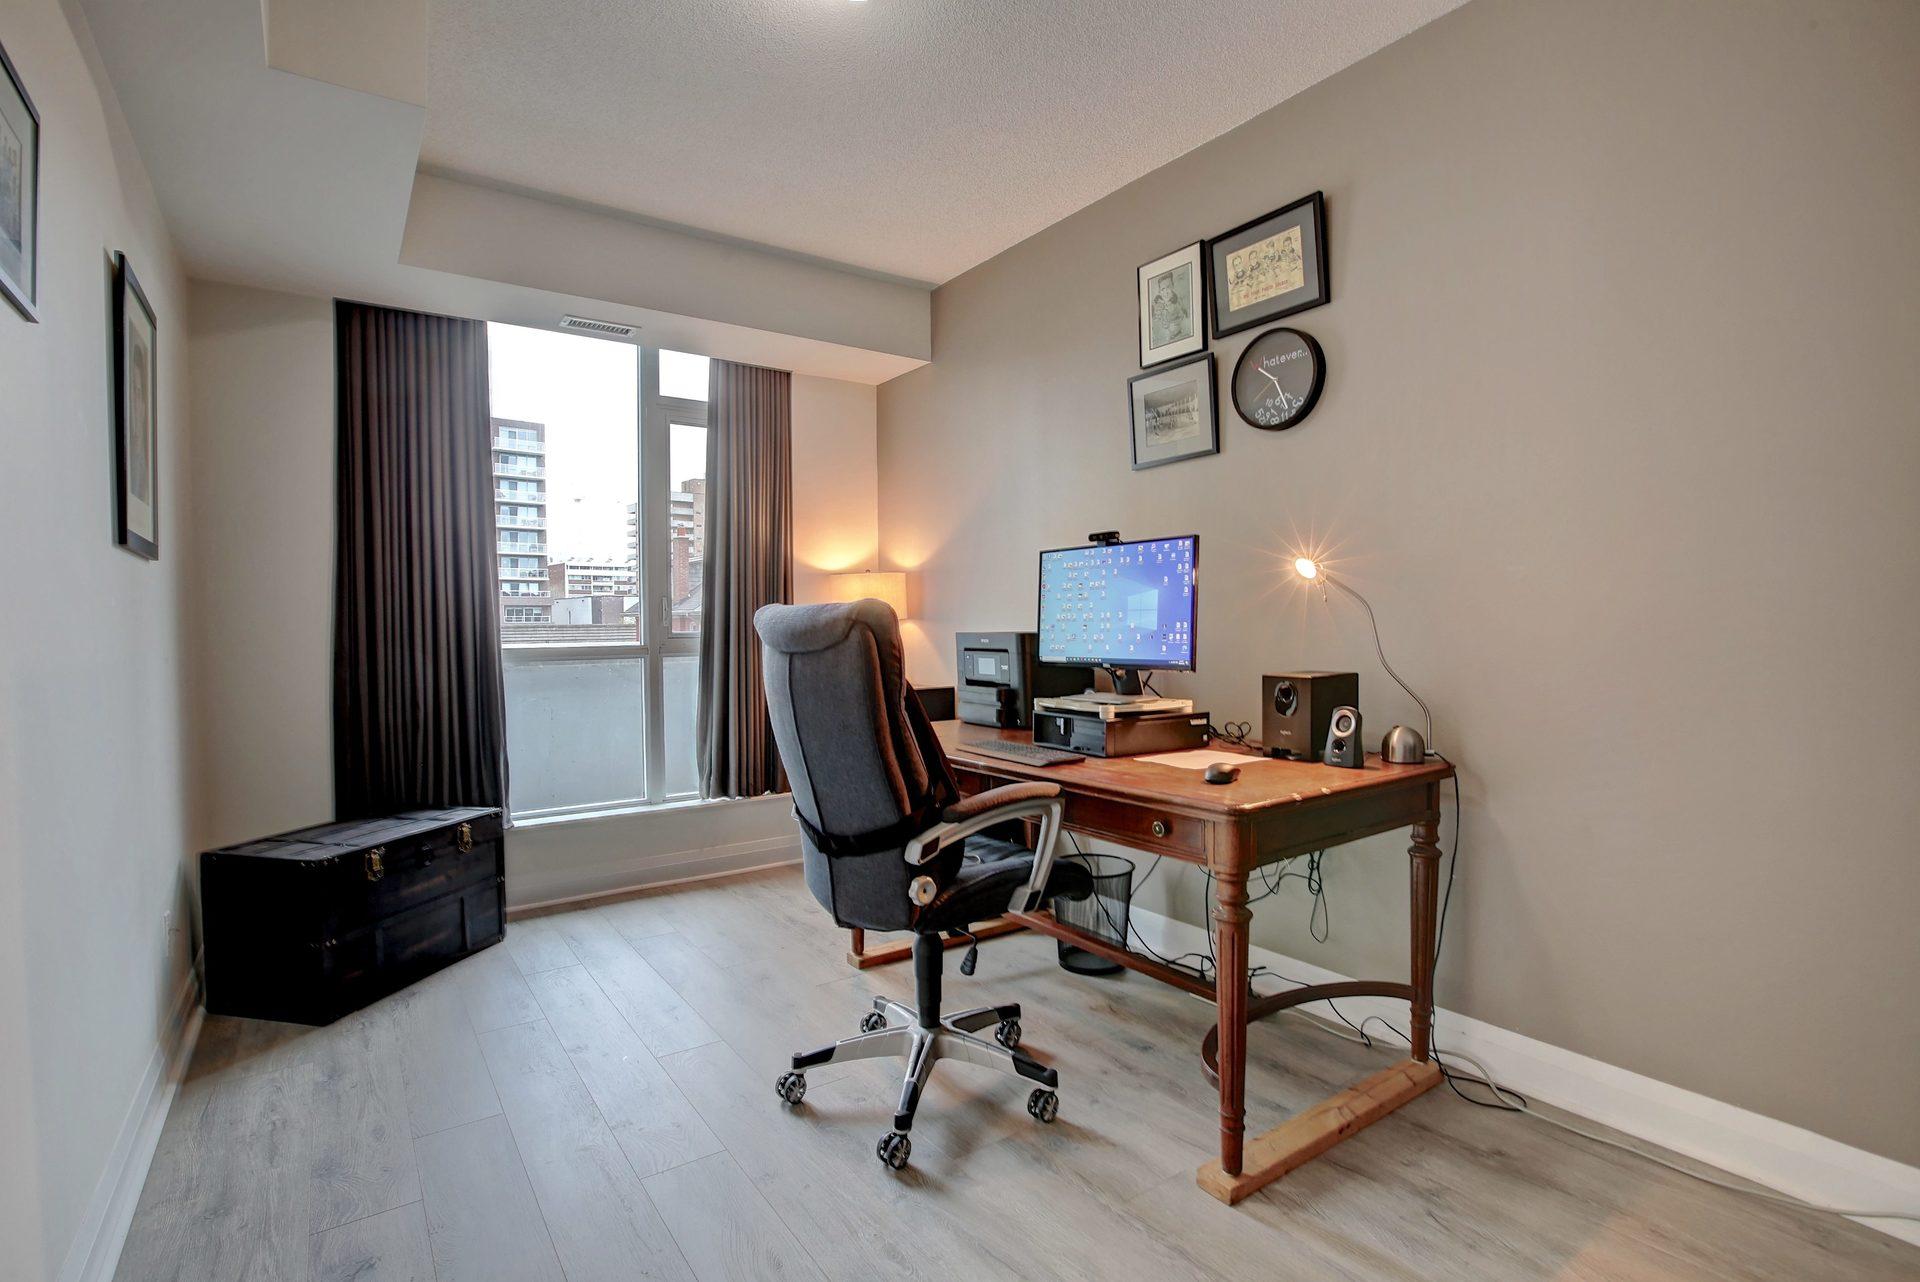 206-1 Hurontario St-Bedroom at 206 - 1 Hurontario Street, Port Credit, Mississauga